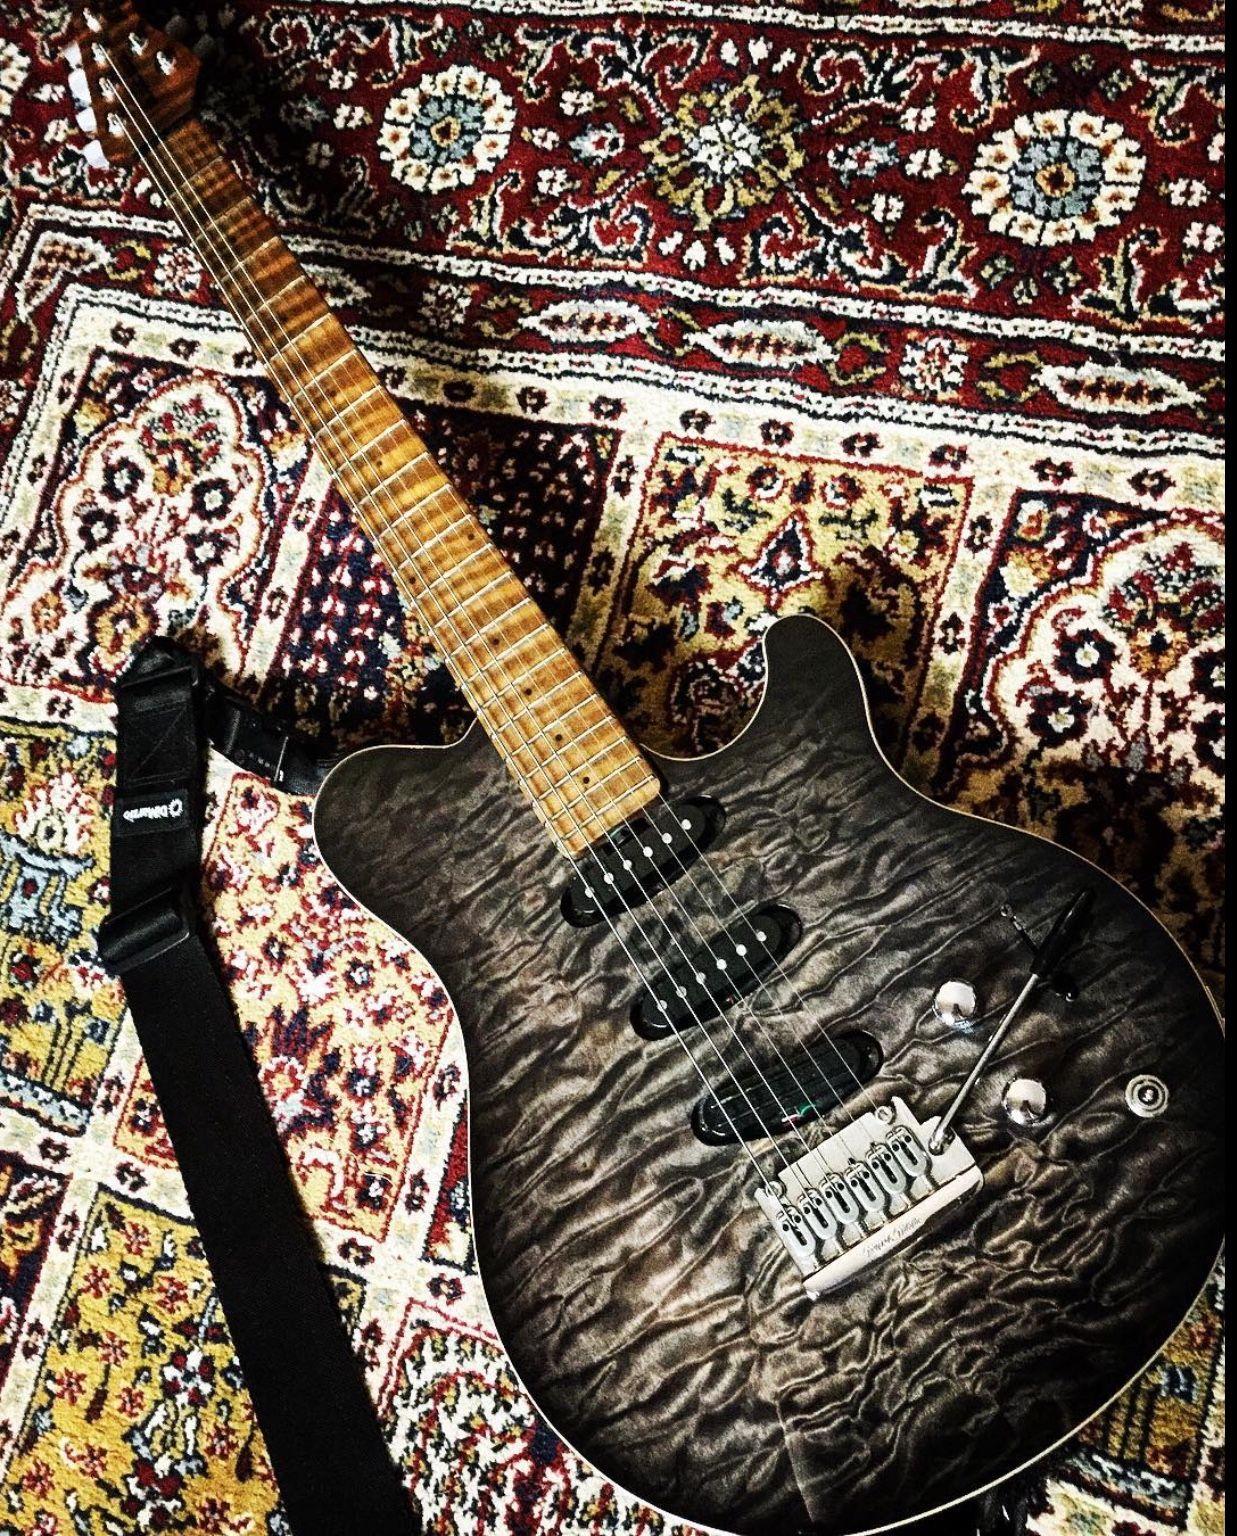 Pin By Adriana Cunha Dos Reis On Guitars Custom Guitars Guitar Rig Guitar